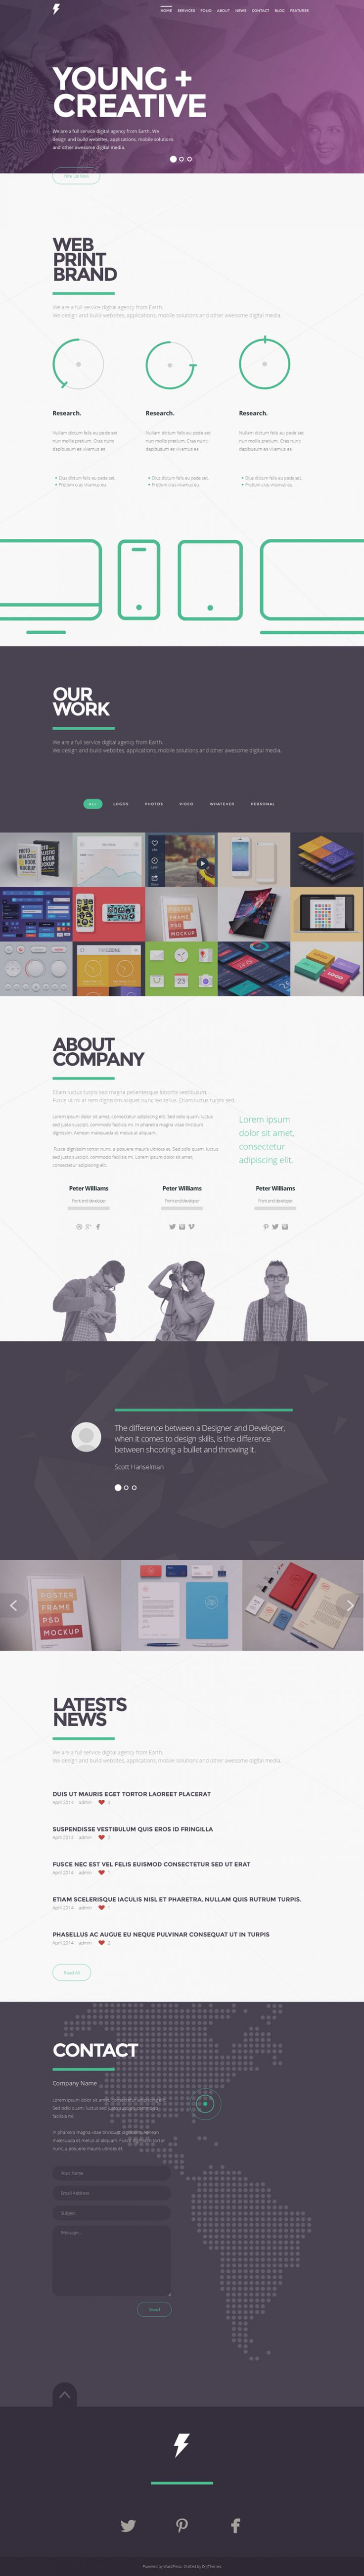 SENSA is simple and clean one page portfolio WordPress theme.